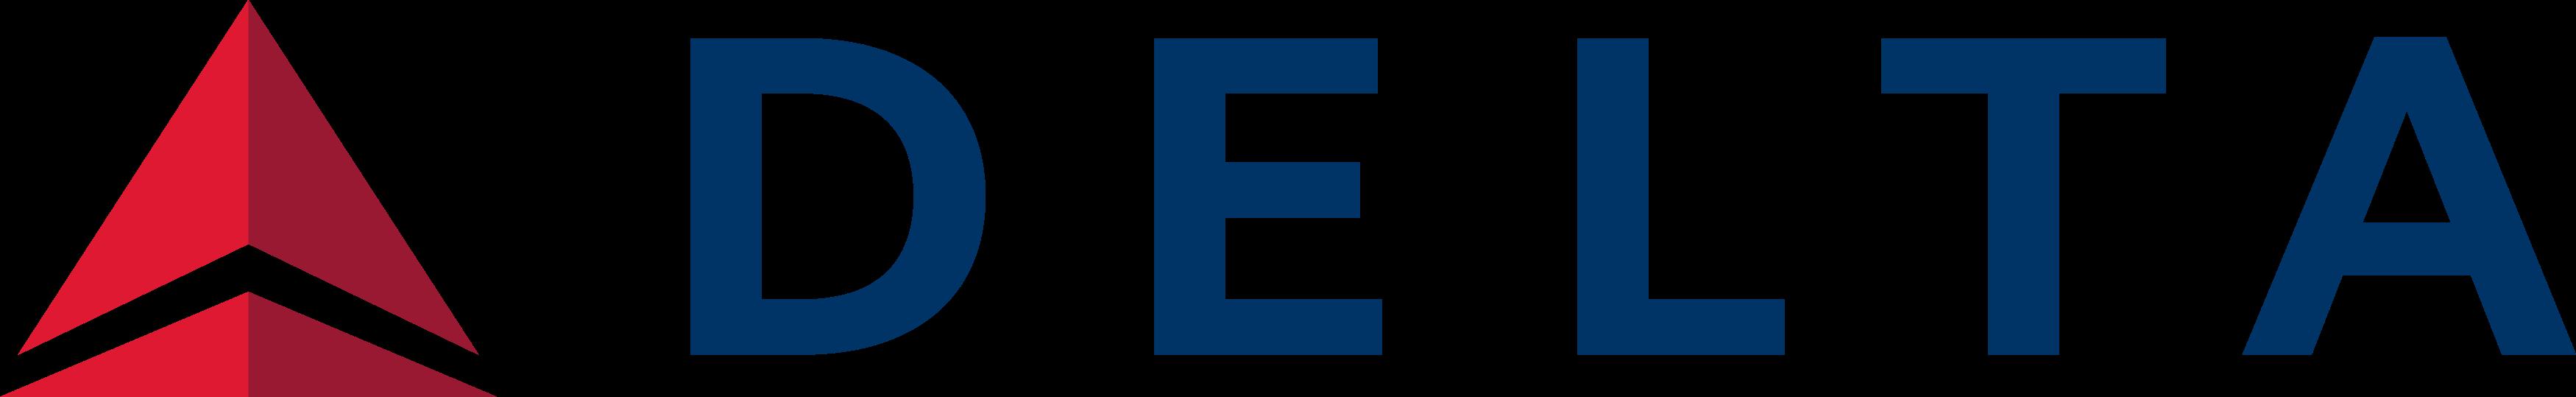 delta air lines logo - Delta Air Lines Logo